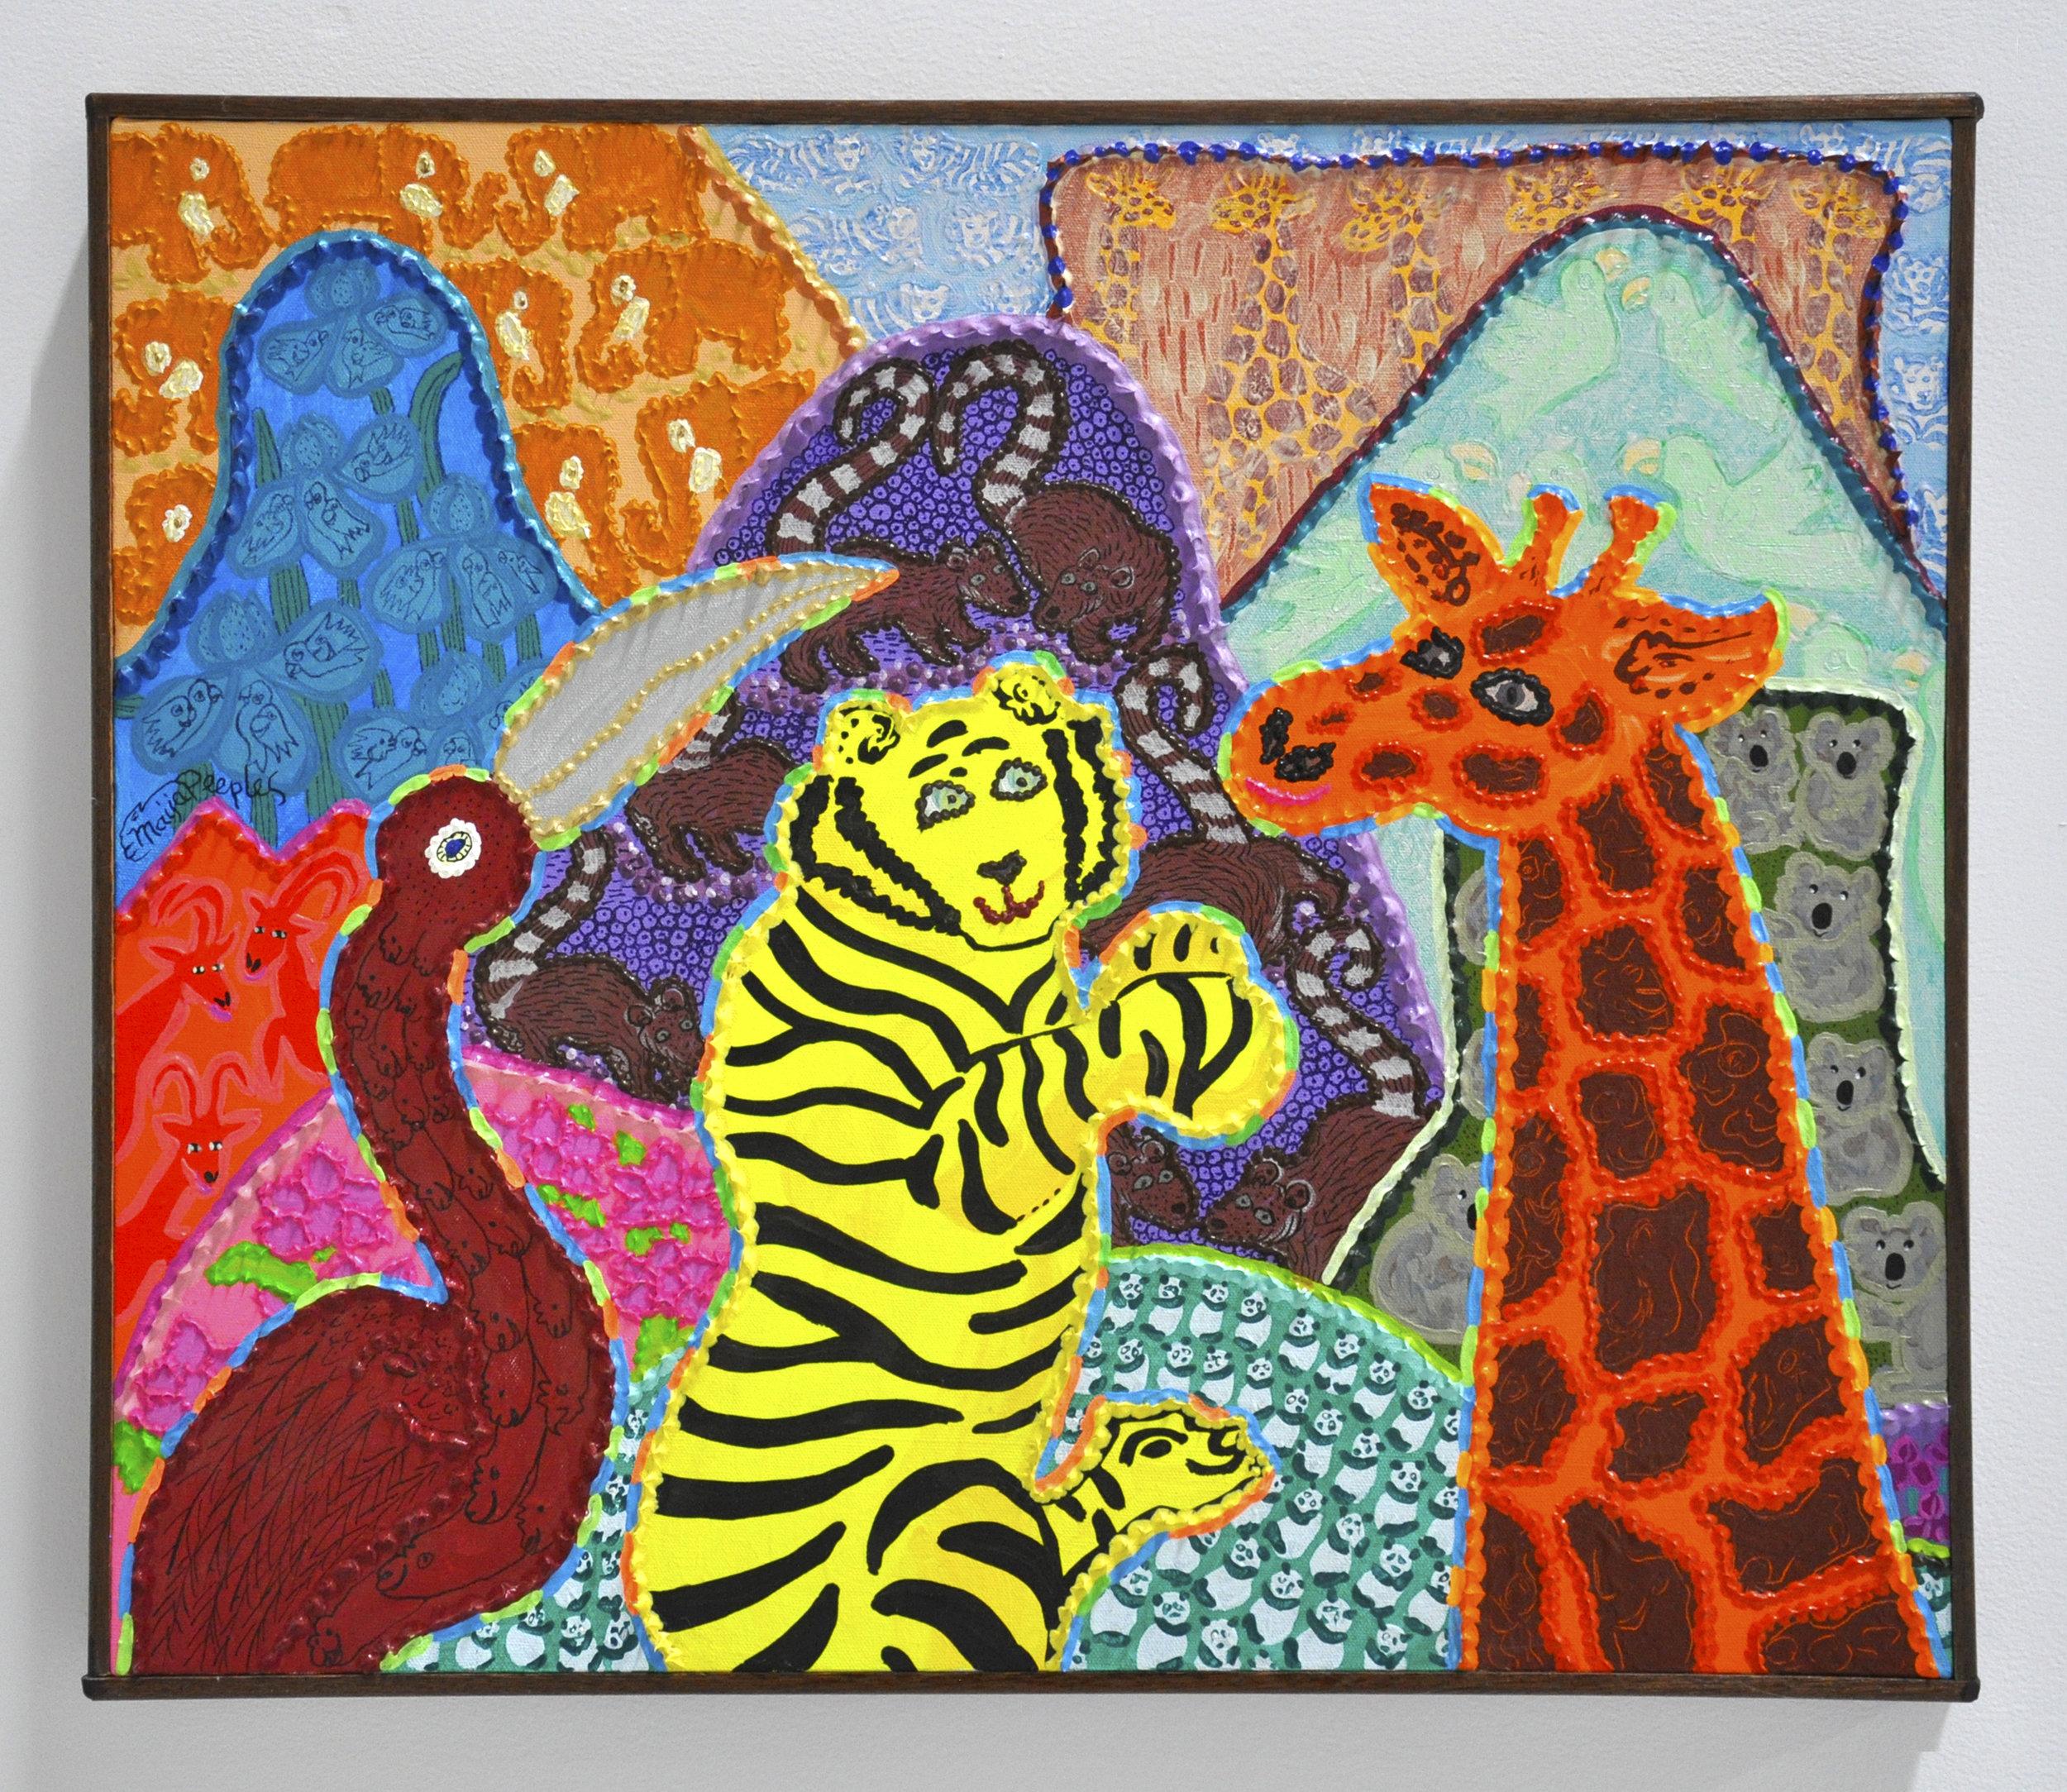 "Maija Peeples-Bright, ""Plezoore Sofine"", acrylic on canvas, 20 1/2 x 24 1/2 in, 1994"